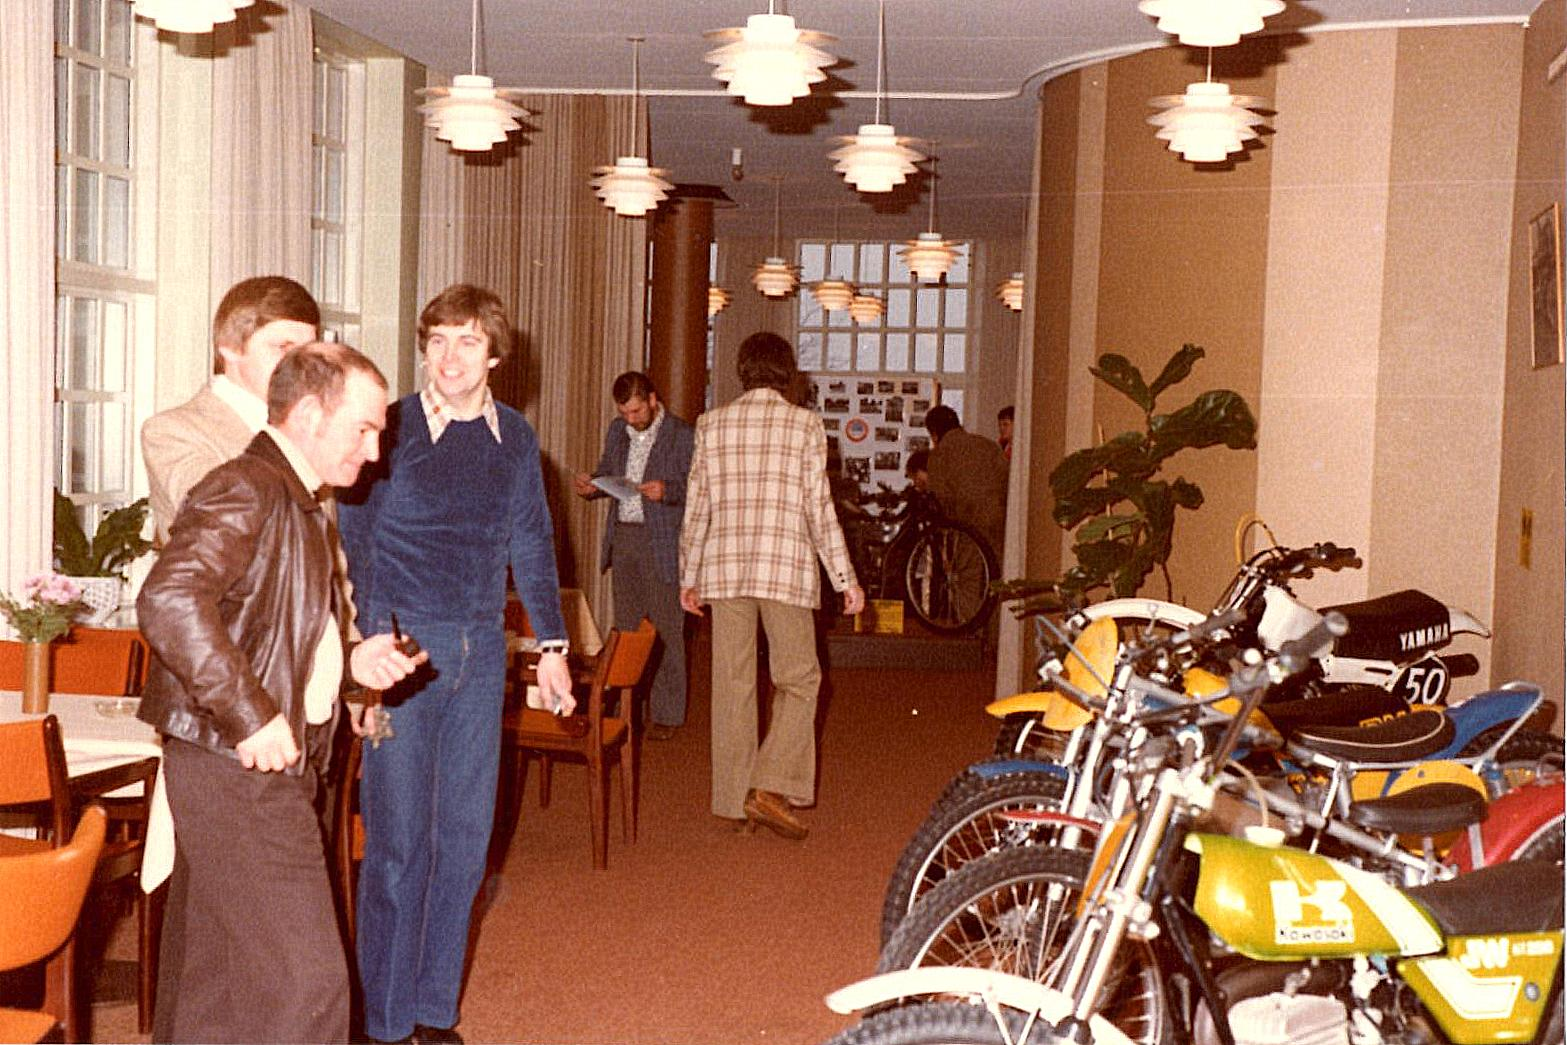 Vagn Kjær, Jørgen Svendsen (næsten skjult) og John Williams inspicerer